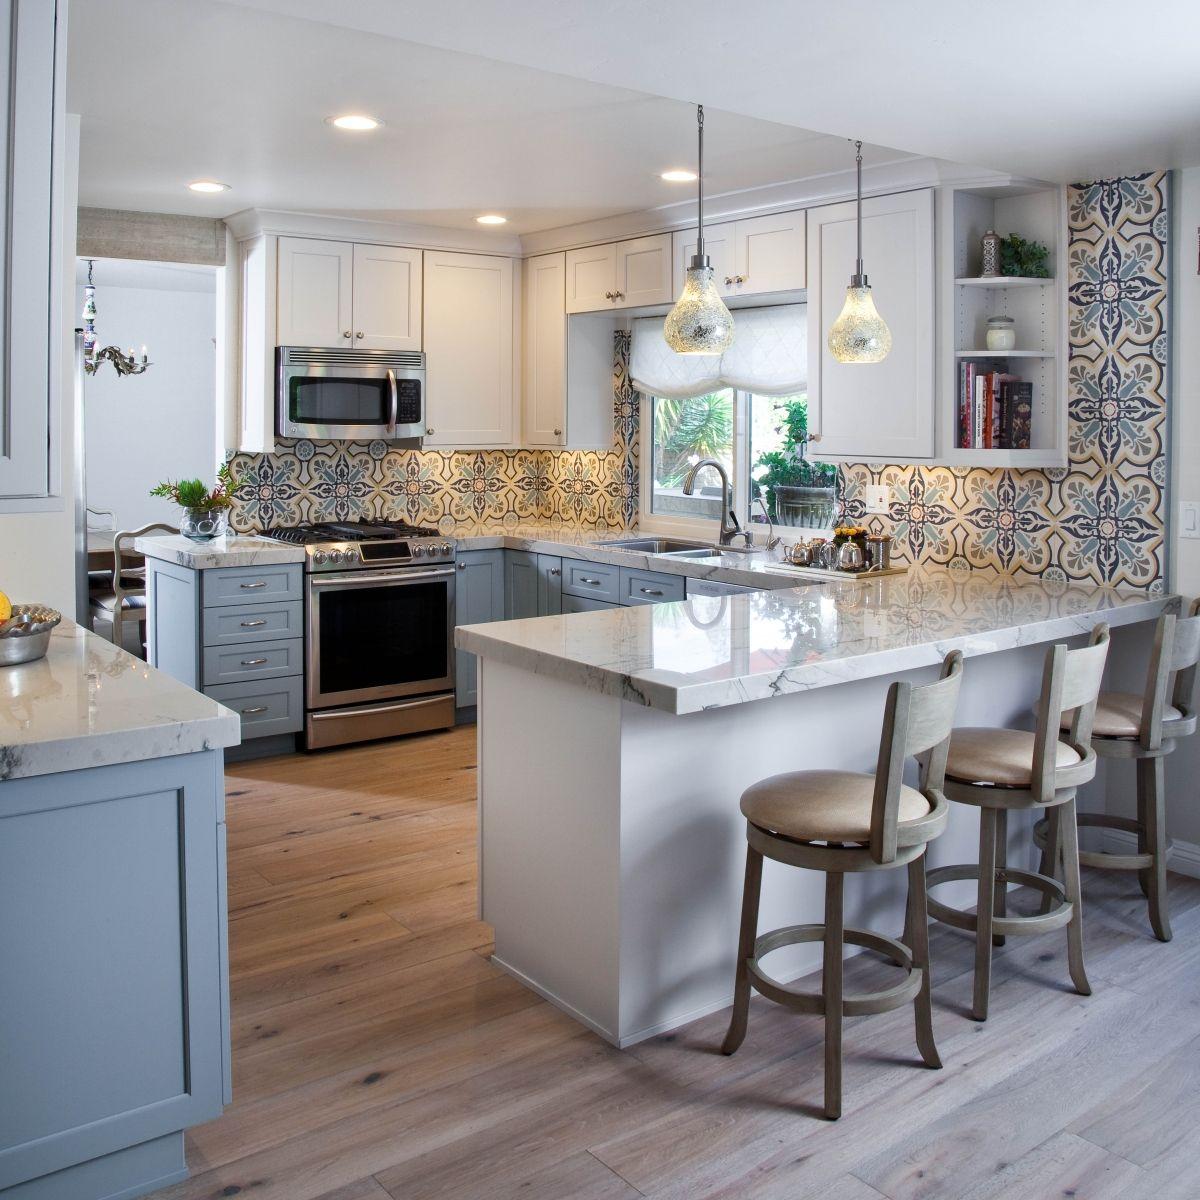 Remodel Stories A Colorful Kitchen Makeover Kitchen Design